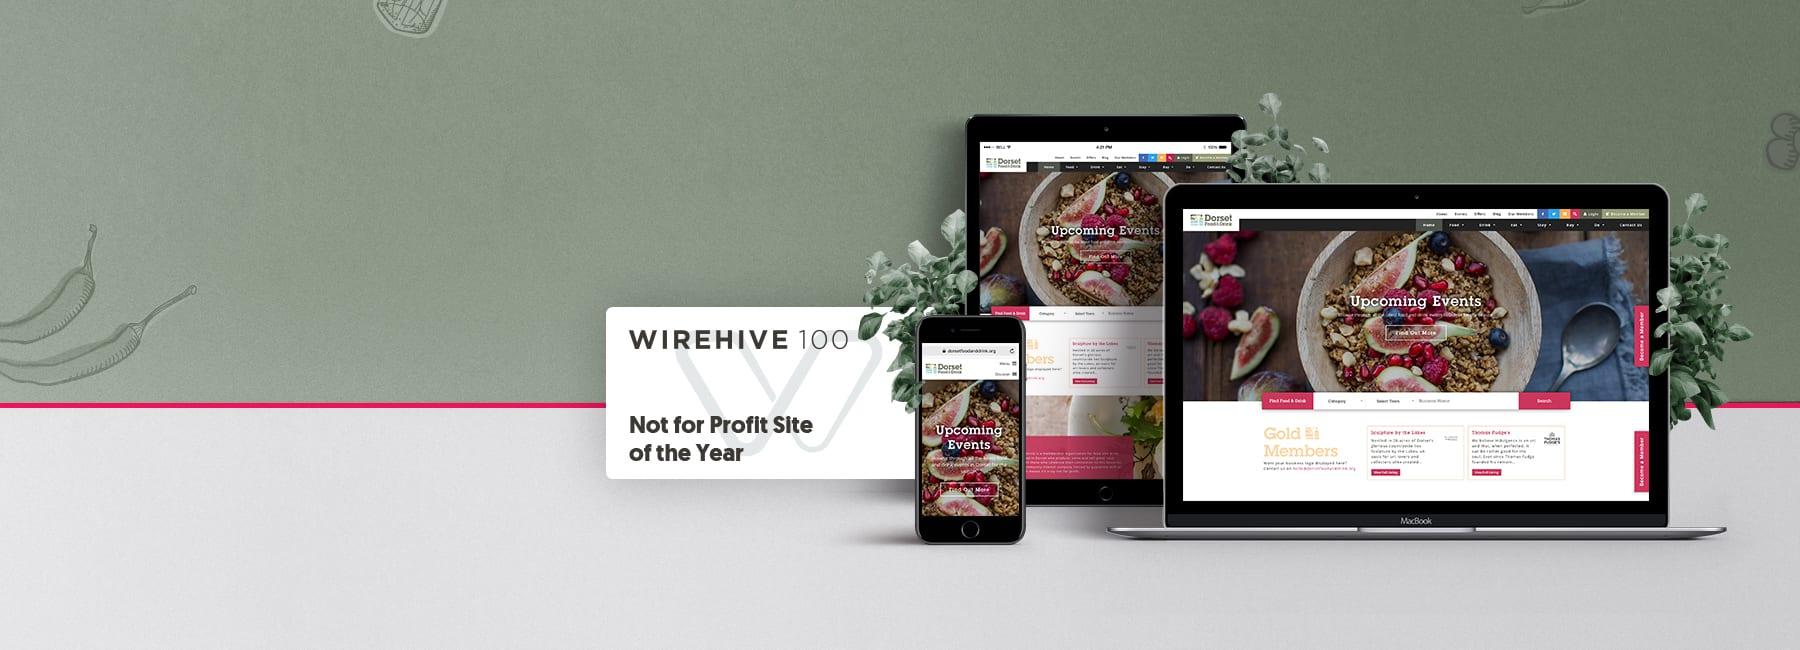 Dorset Food and Drink Wirehive Winnerjpg